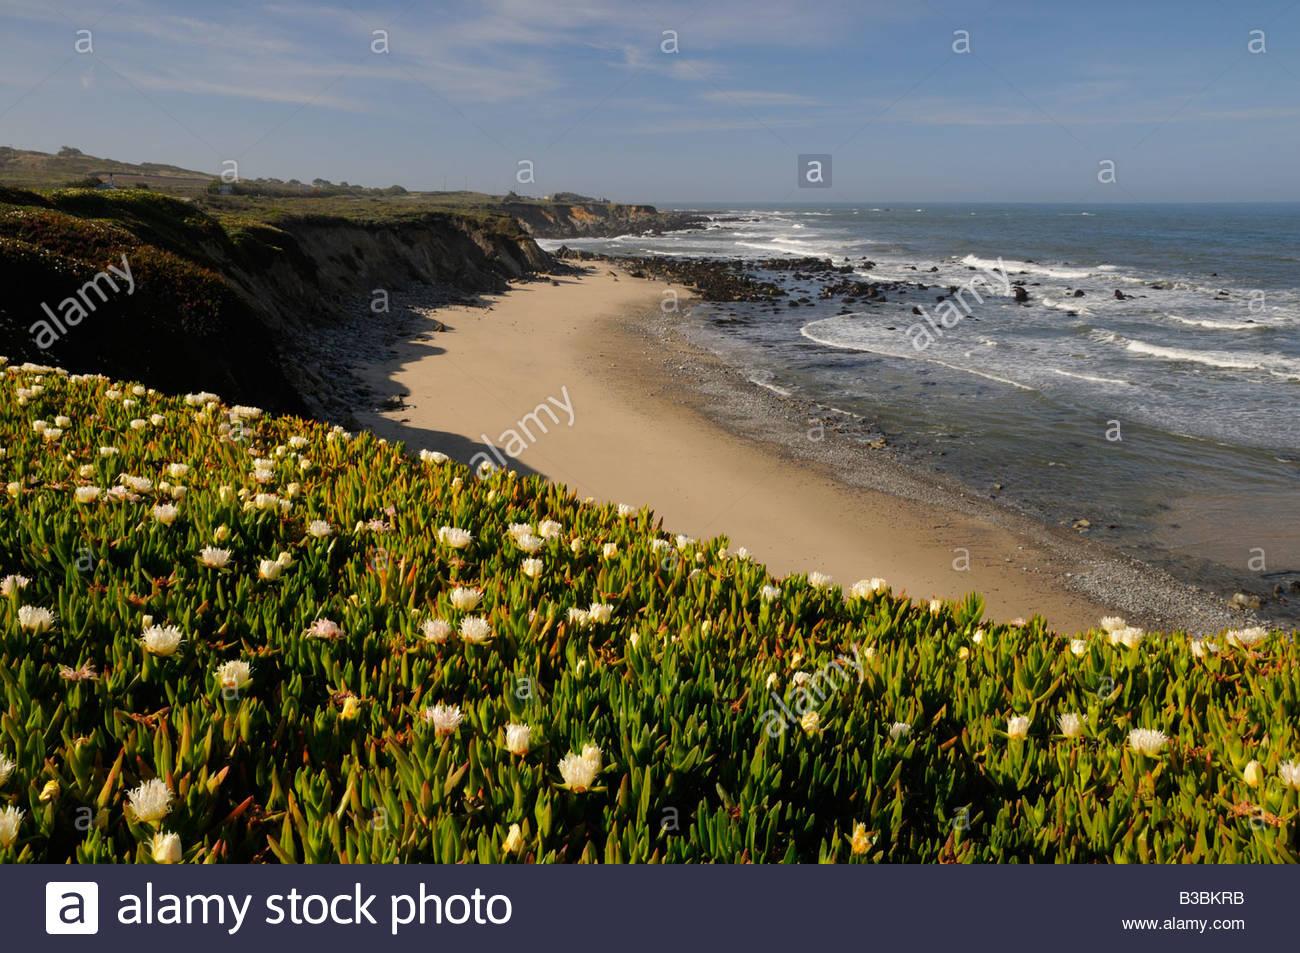 California san mateo county pescadero - Ice Plant In Bloom Along Pacific Coastline Beach At Pescadero State Beach San Mateo County Ca